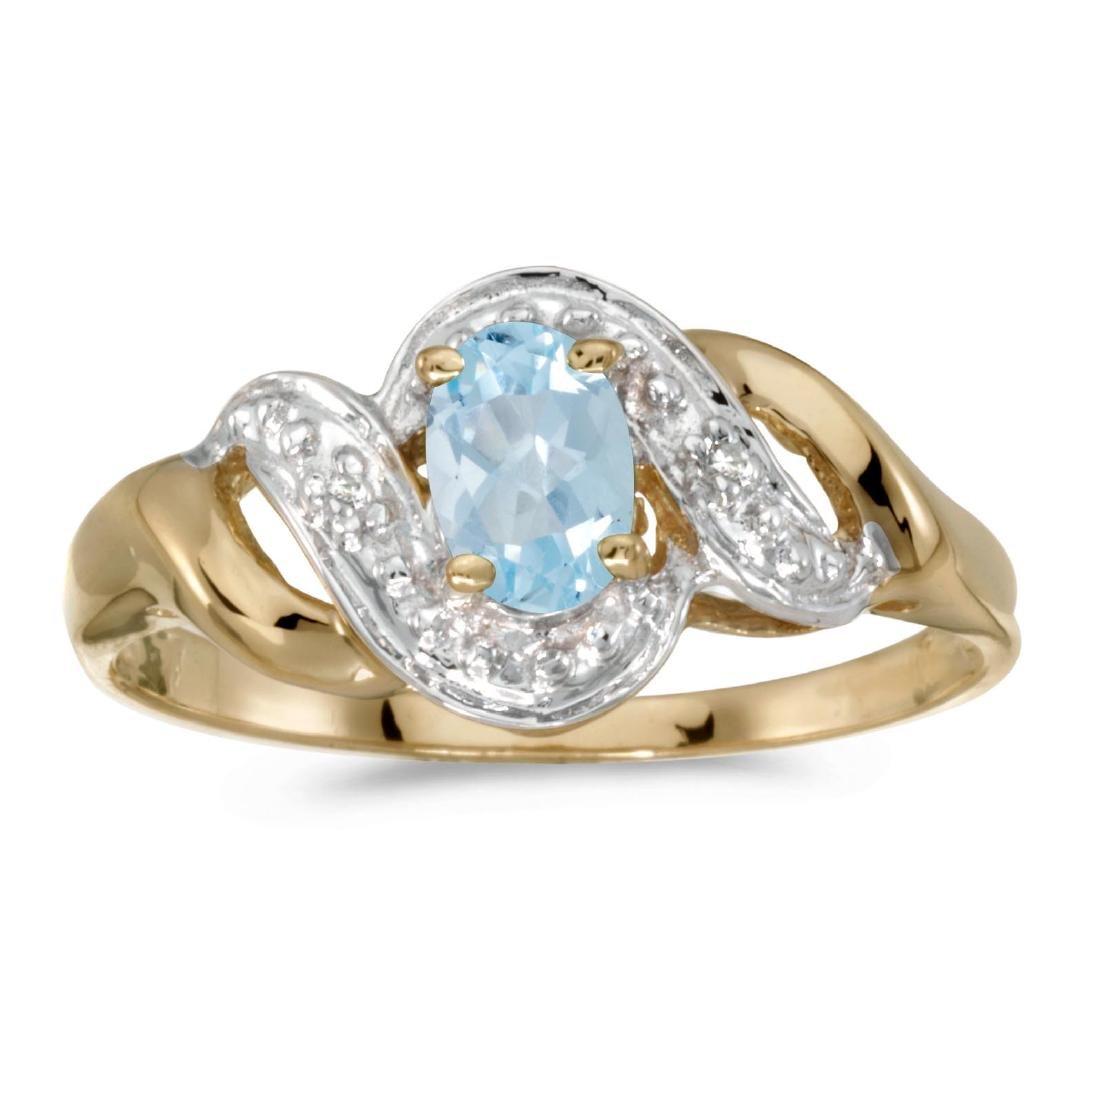 Certified 14k Yellow Gold Oval Aquamarine And Diamond S